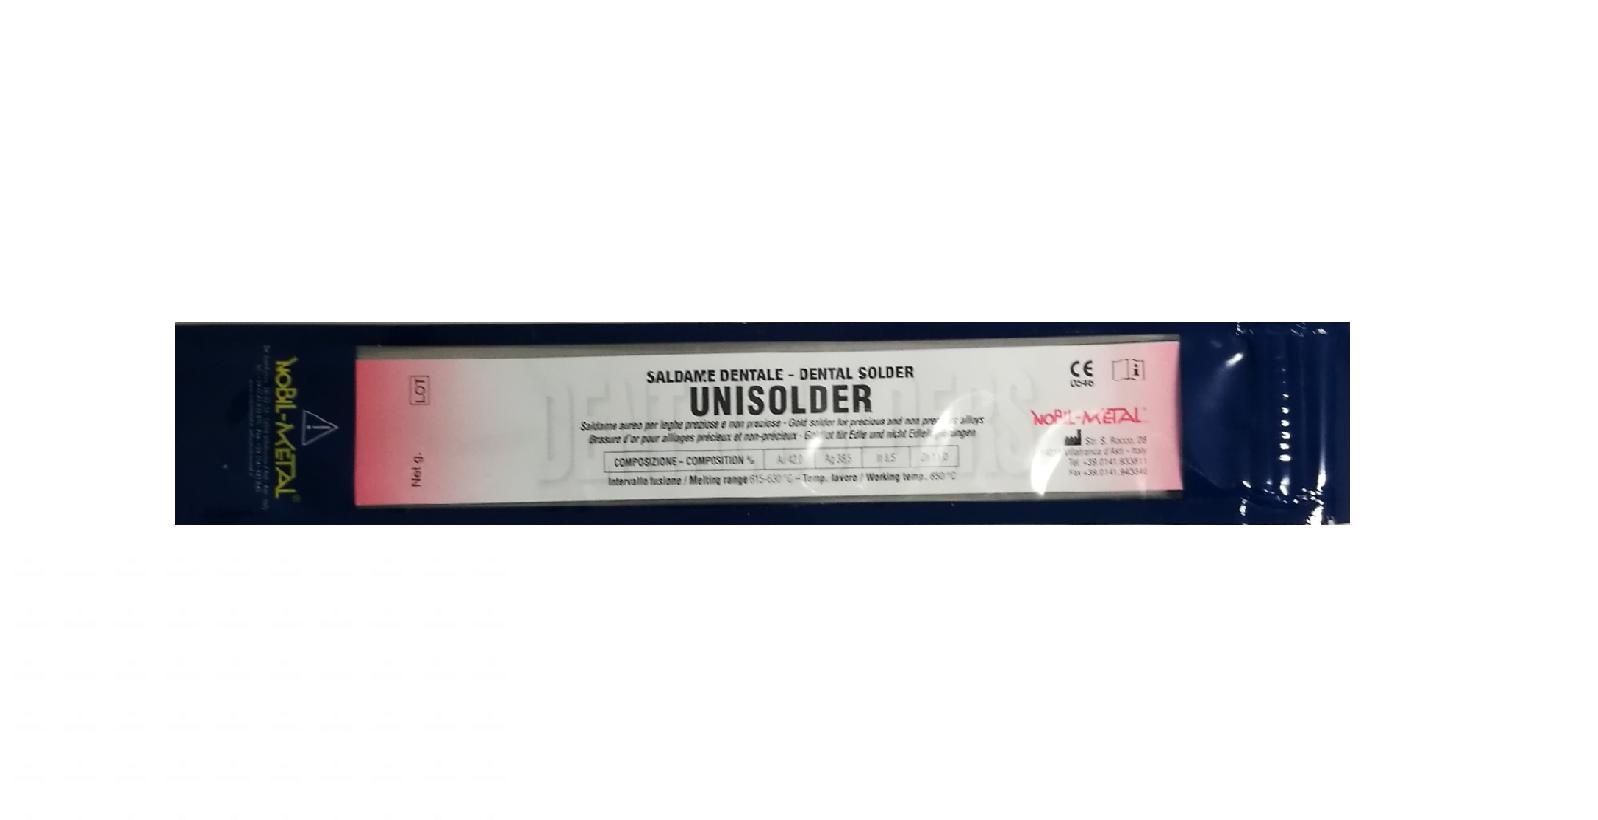 NOBIL METAL UNISOLDER LV21 (CEKA SOL  L CS21) - Lot in Röhrenform mit integriertem Flussmittel, gelb 615-630 °C